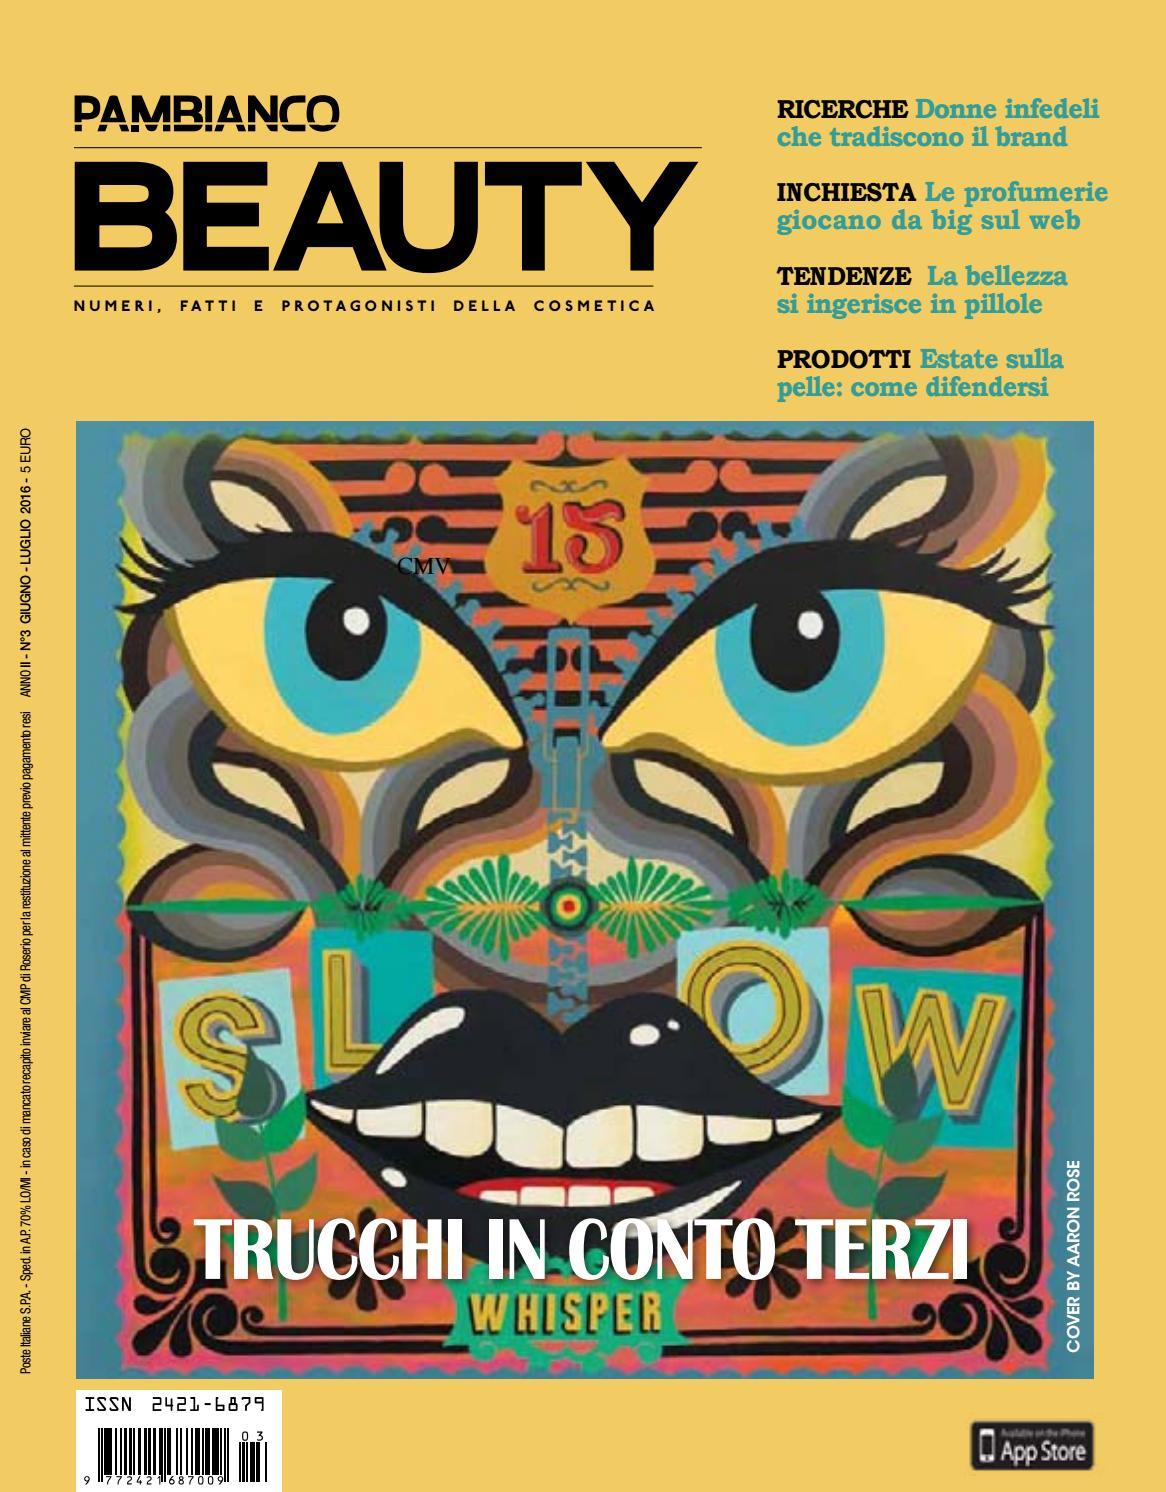 Pambianco Beauty n° 3 by Pambianconews - issuu 31242f7c5dbca